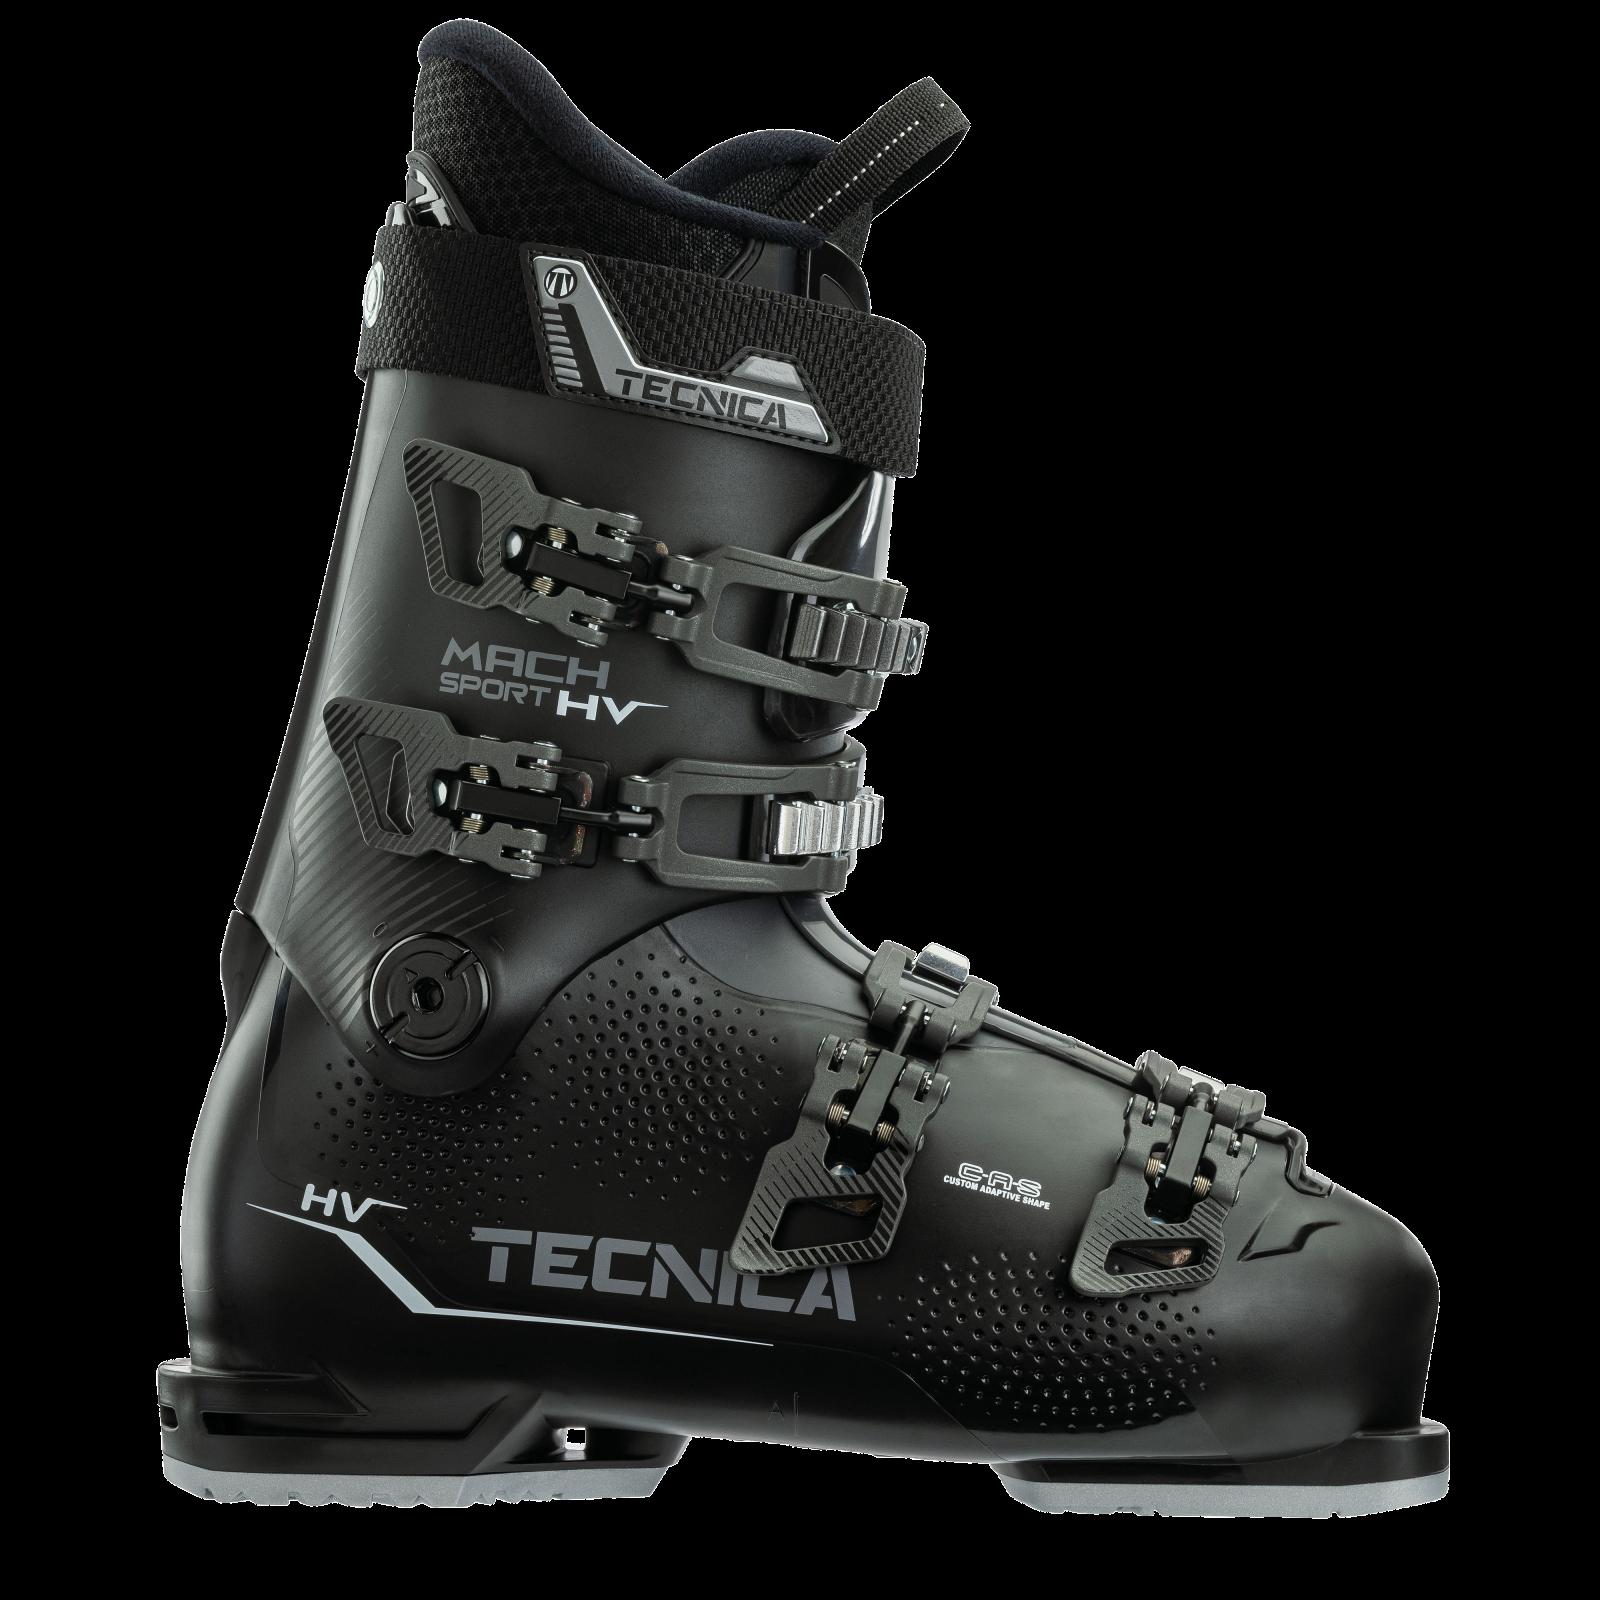 2022 Tecnica Mach Sport HV 70 Men's Ski Boots